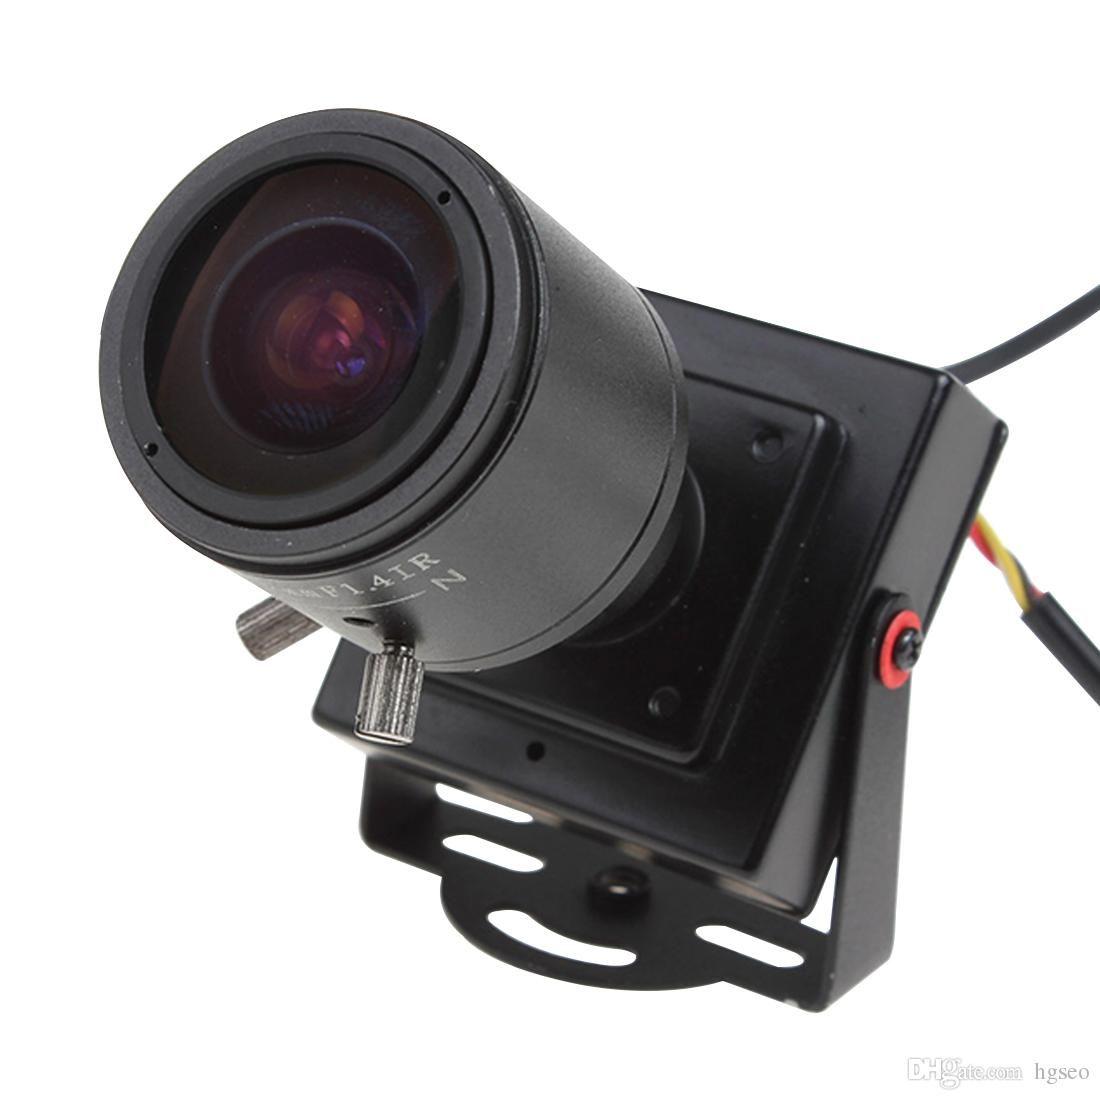 2.8-12mm 수동 렌즈 미니 HD 700TVL 1/3 CMOS 보안 오디오 비디오 컬러 CCTV 카메라 CCT_535